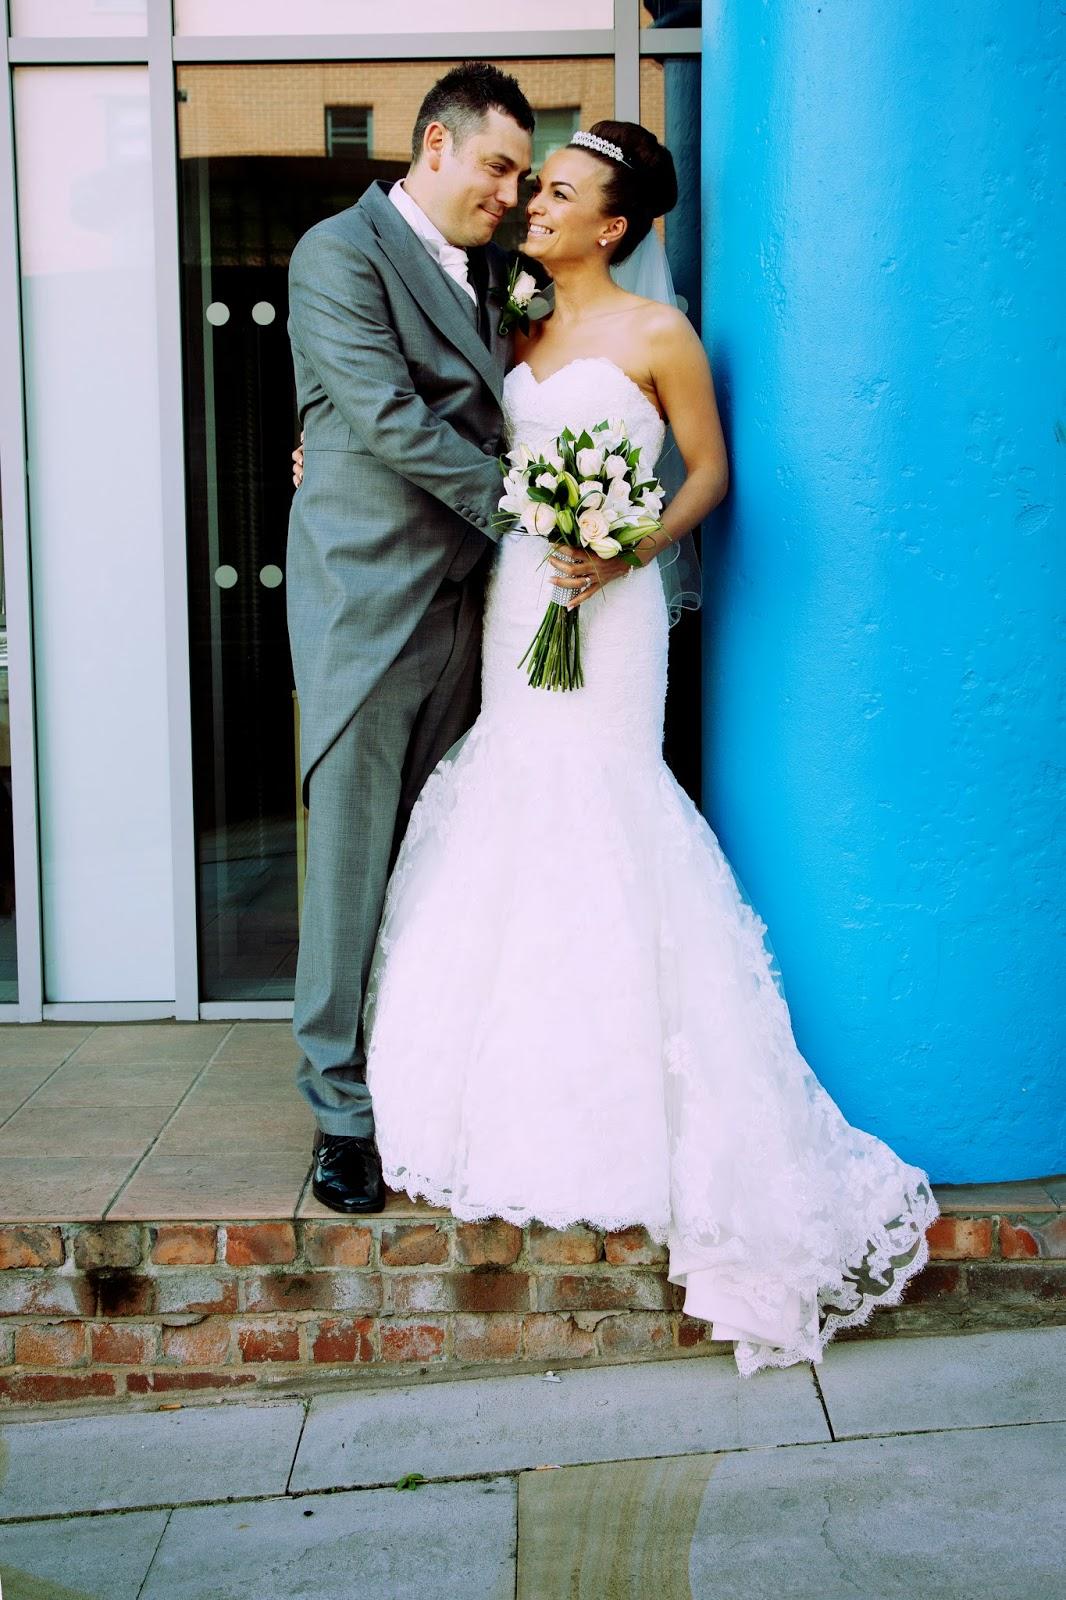 The Place Hotel Wedding Photographer: January 2014